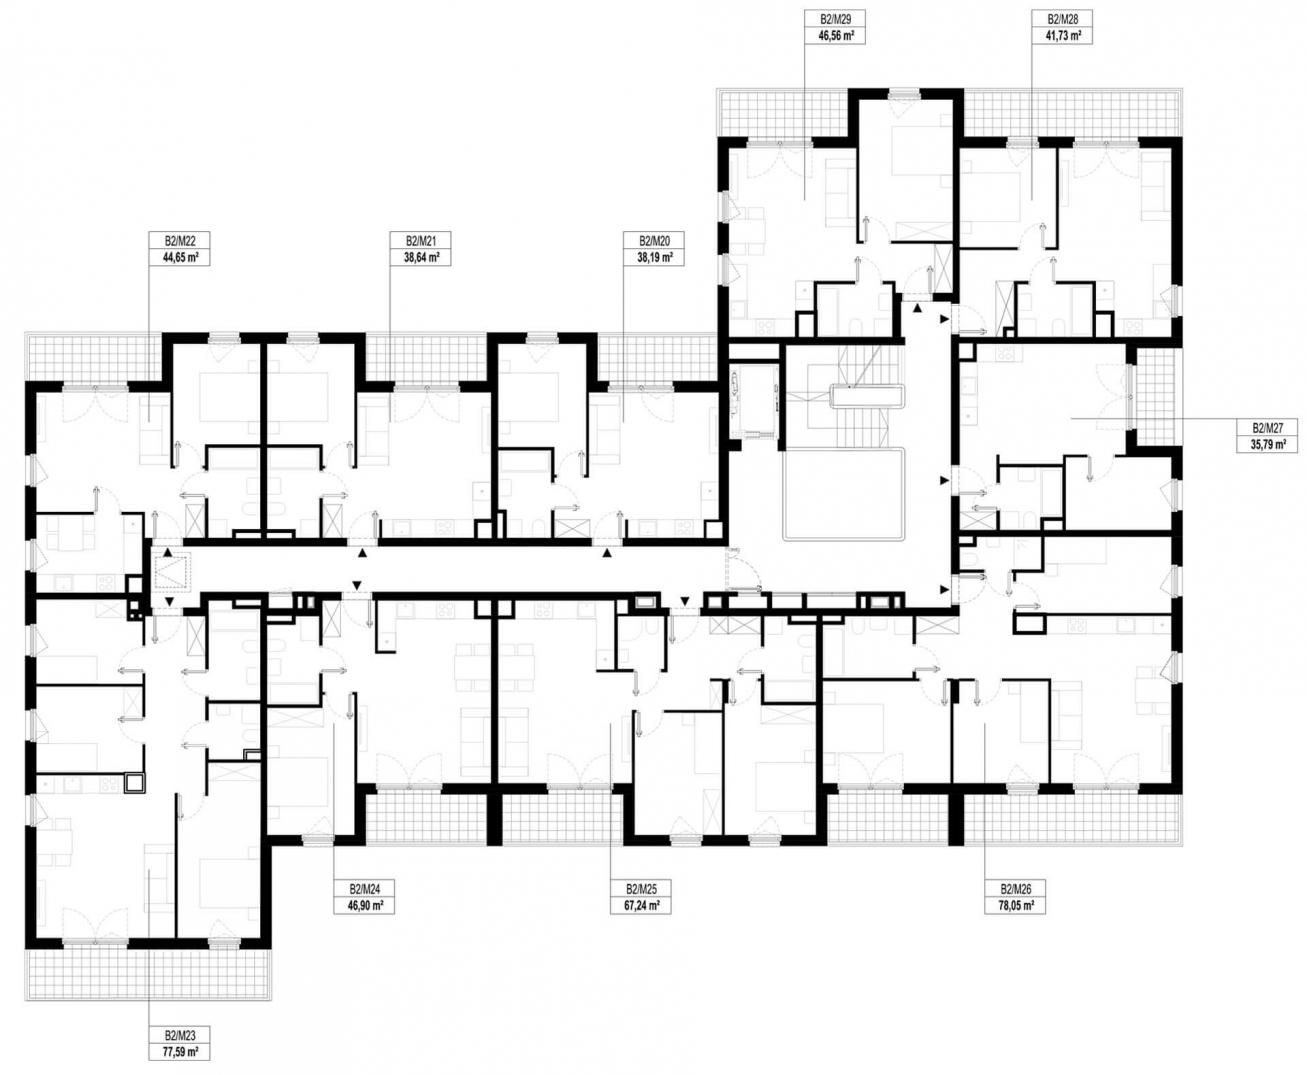 Etap 2 - Budynek B - Piętro 2